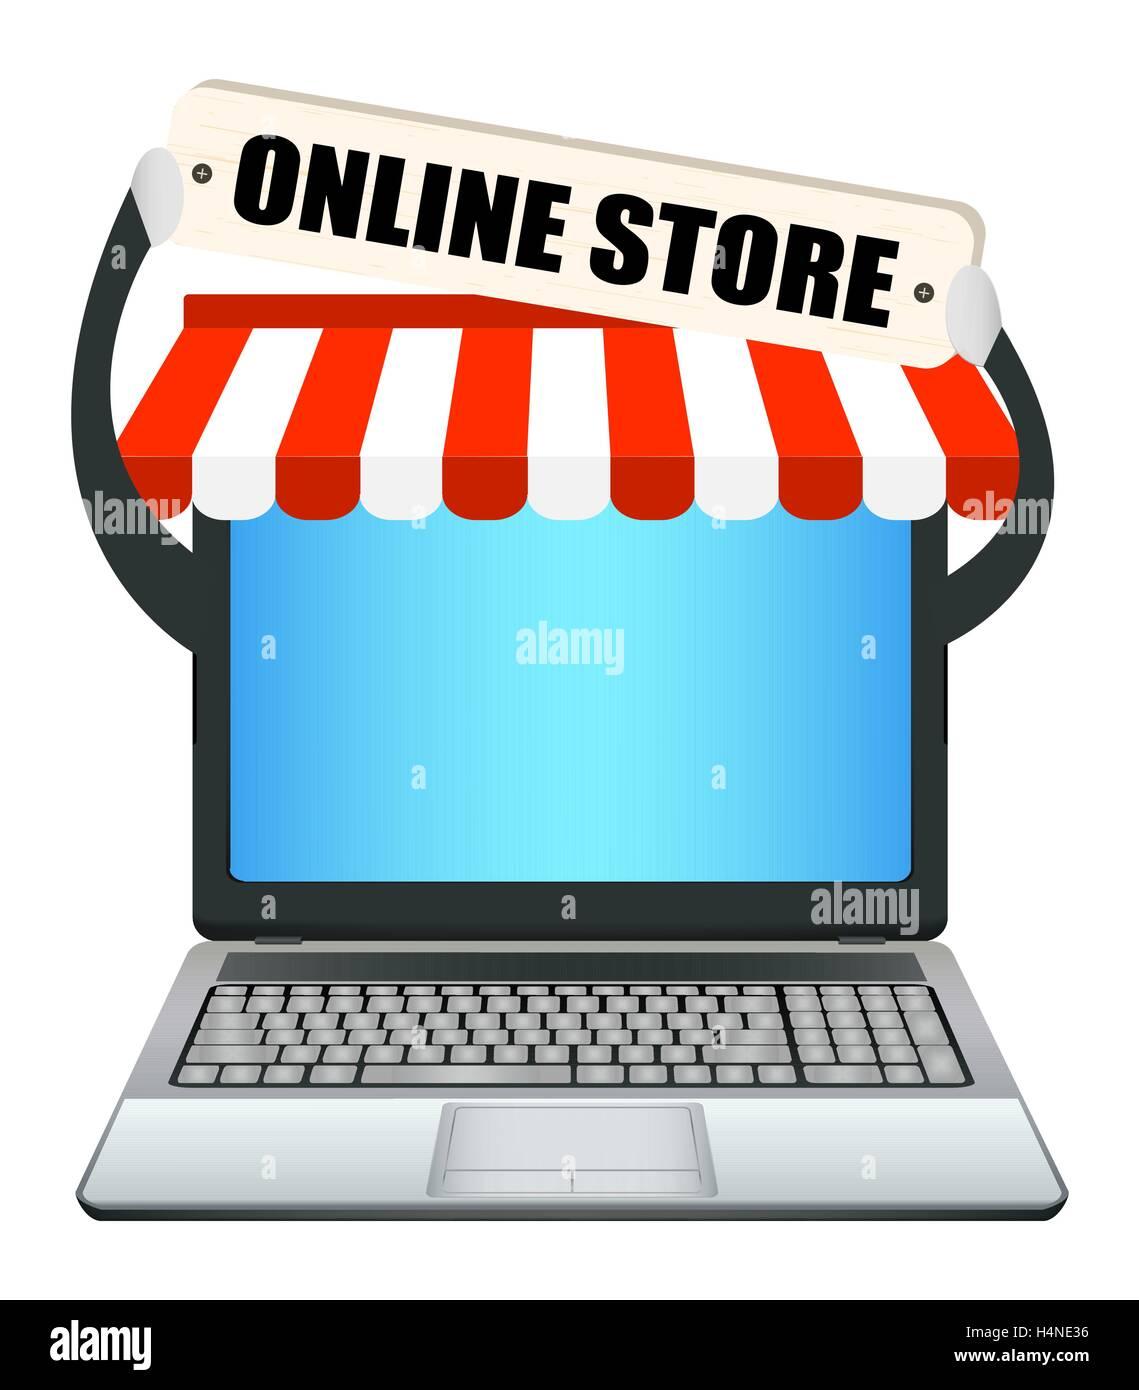 laptop with online store banner stock vector art illustration rh alamy com Blackboard Clip Art Transparent Blackboard Clip Art Transparent